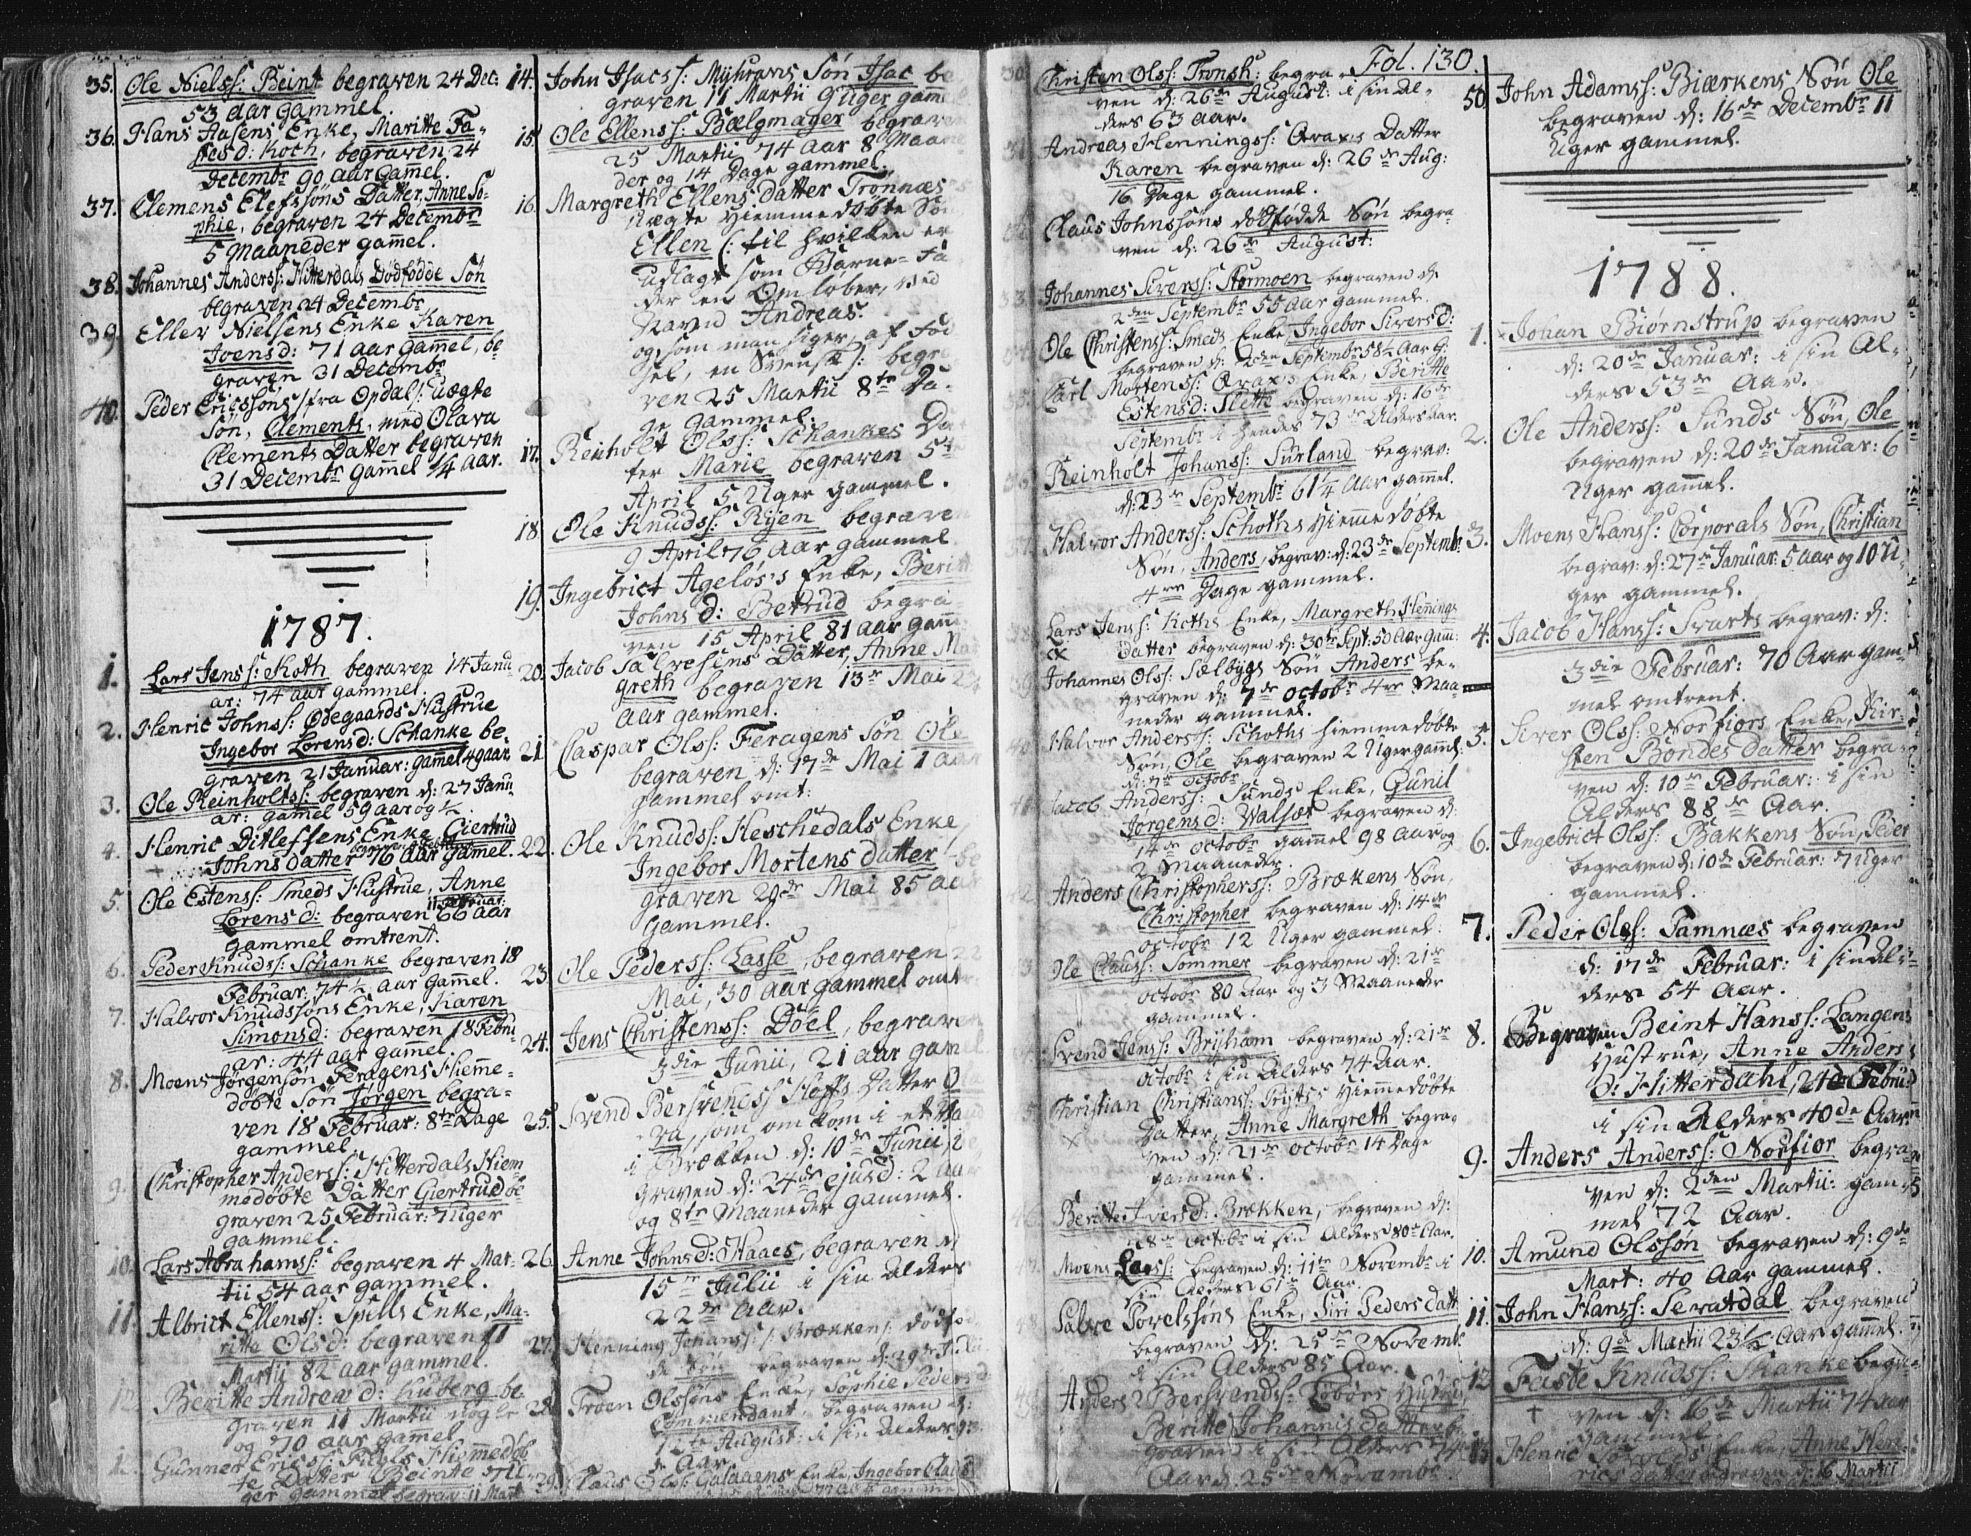 SAT, Ministerialprotokoller, klokkerbøker og fødselsregistre - Sør-Trøndelag, 681/L0926: Parish register (official) no. 681A04, 1767-1797, p. 130